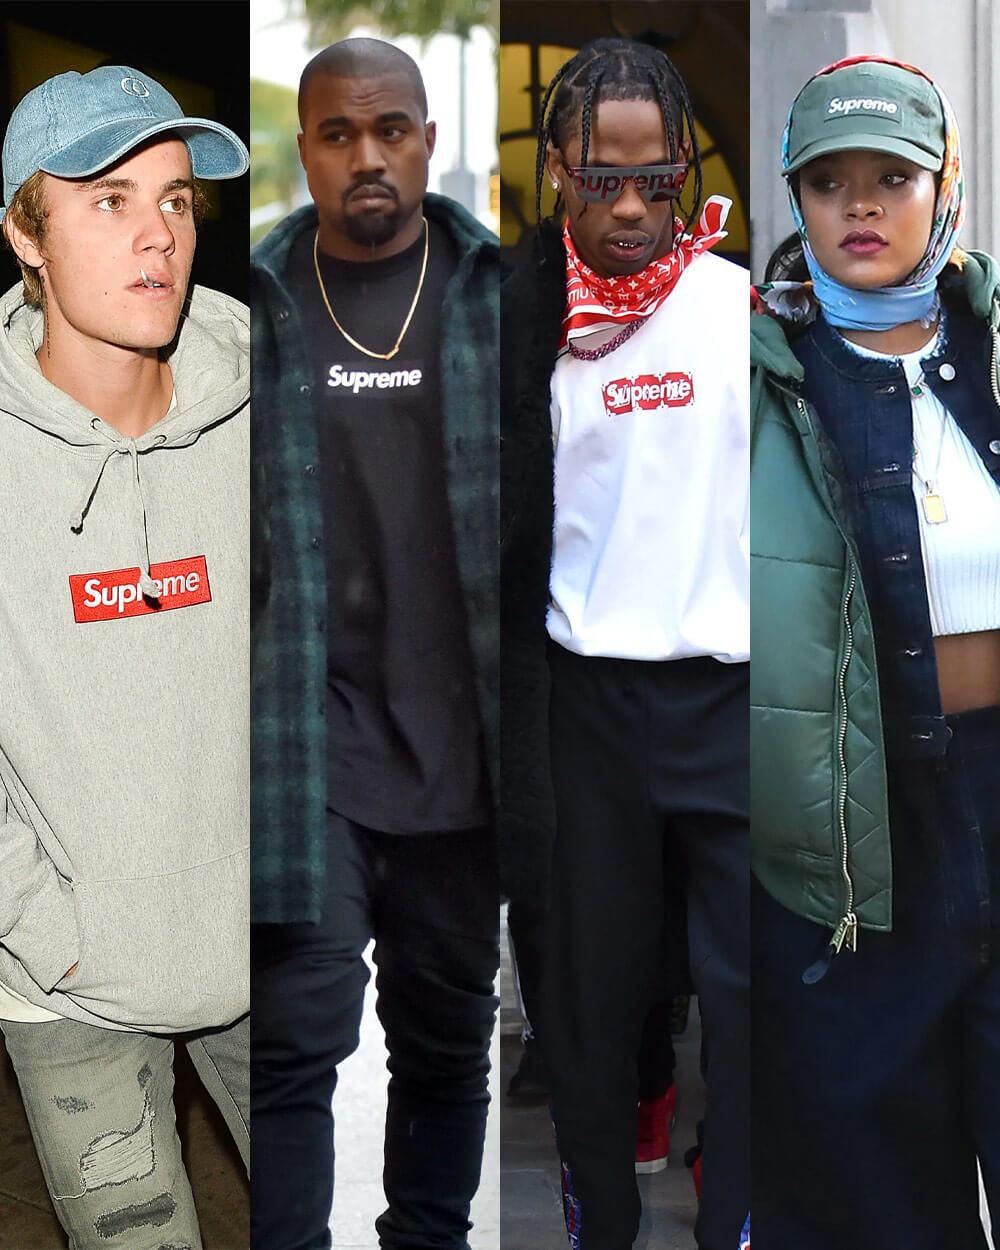 Supreme on celebrities